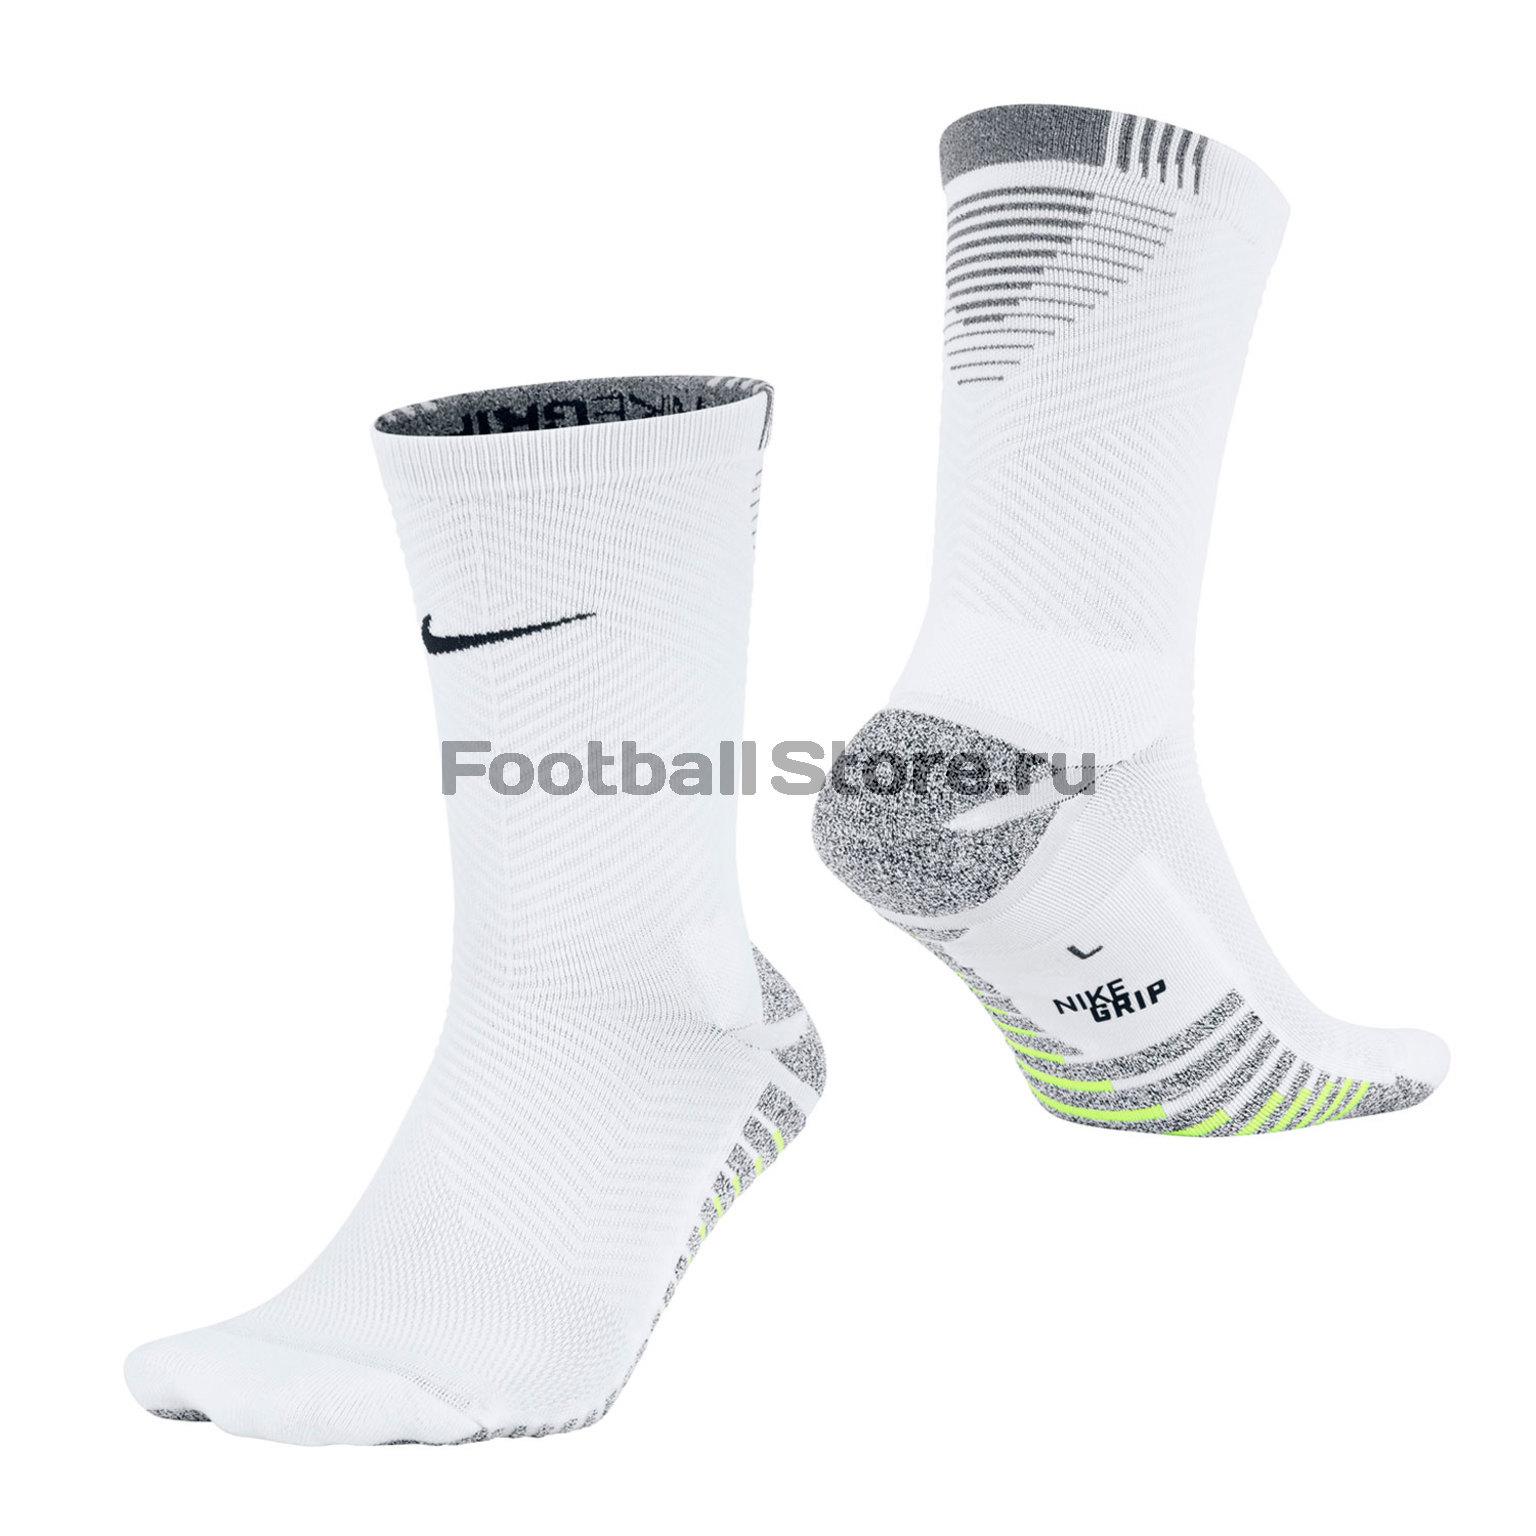 Носки Nike Носки Nike Grip Strike Light Crew SX5486-100 носки nike носки nike grip strike lightweight sx5089 525